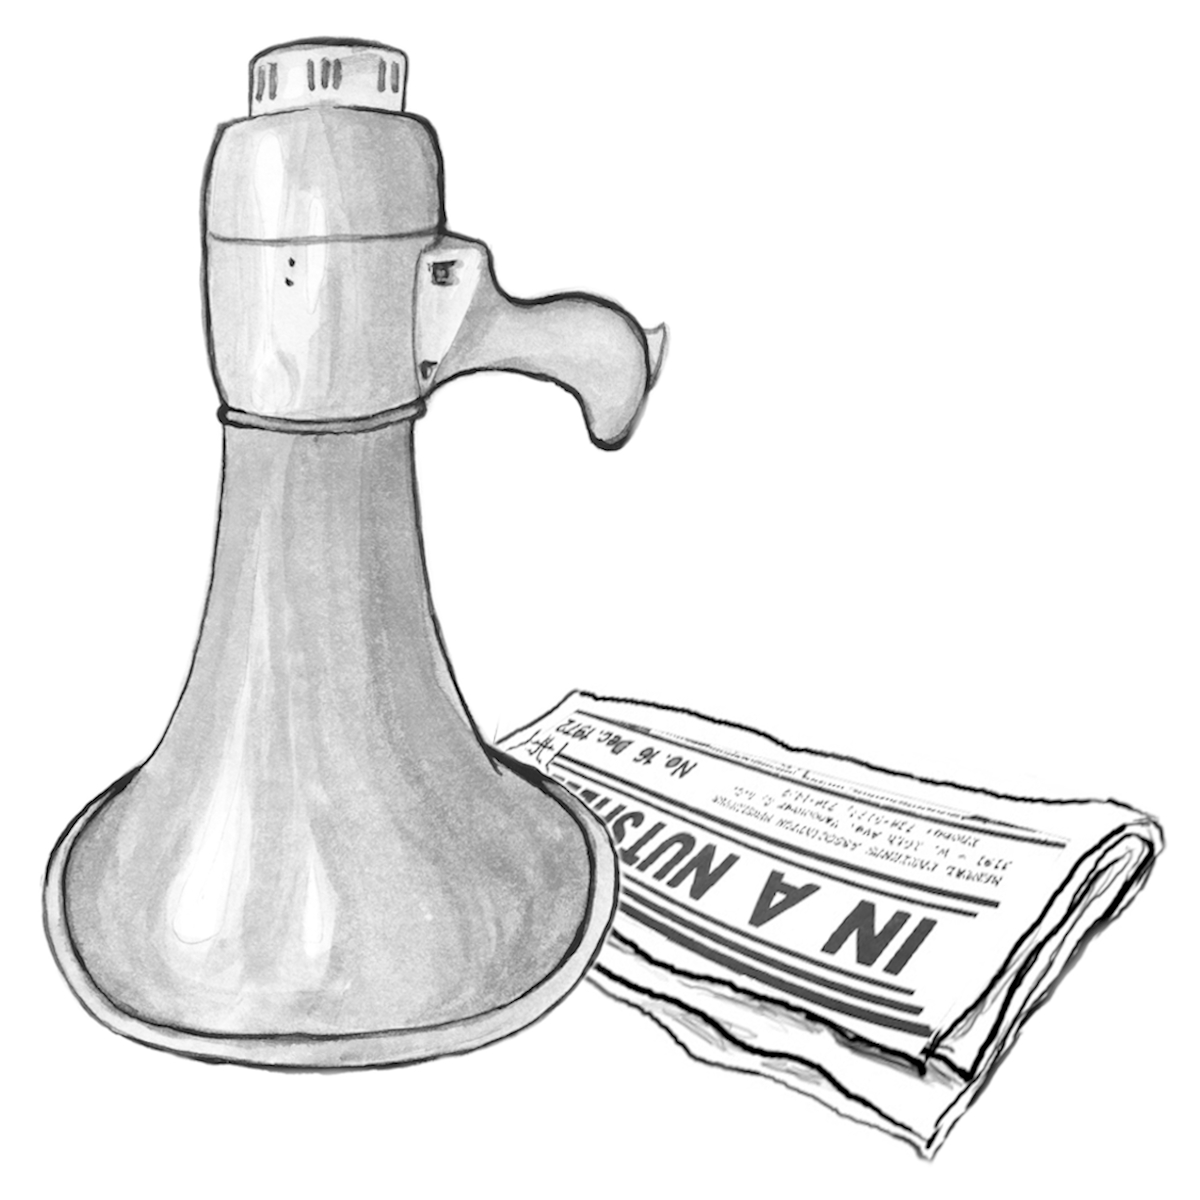 megaphone and copy of newspaper